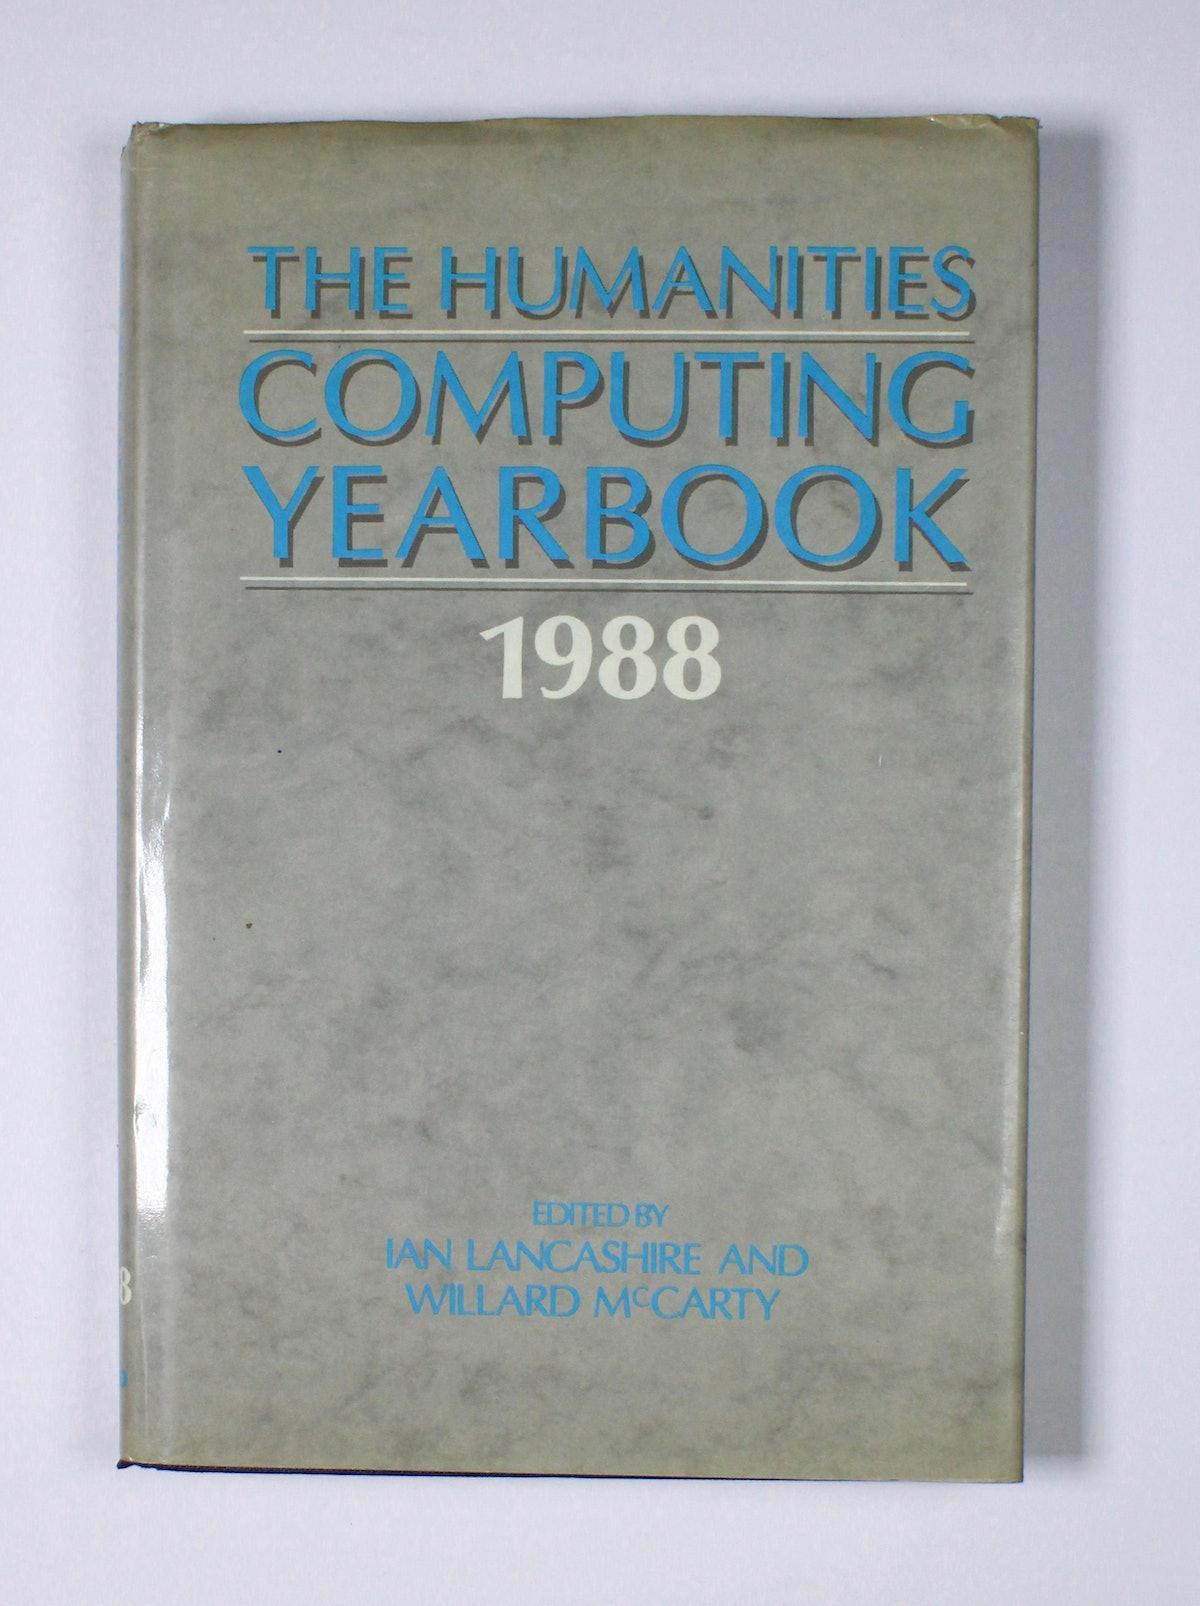 The Humanities Computing Yearbook - 1988